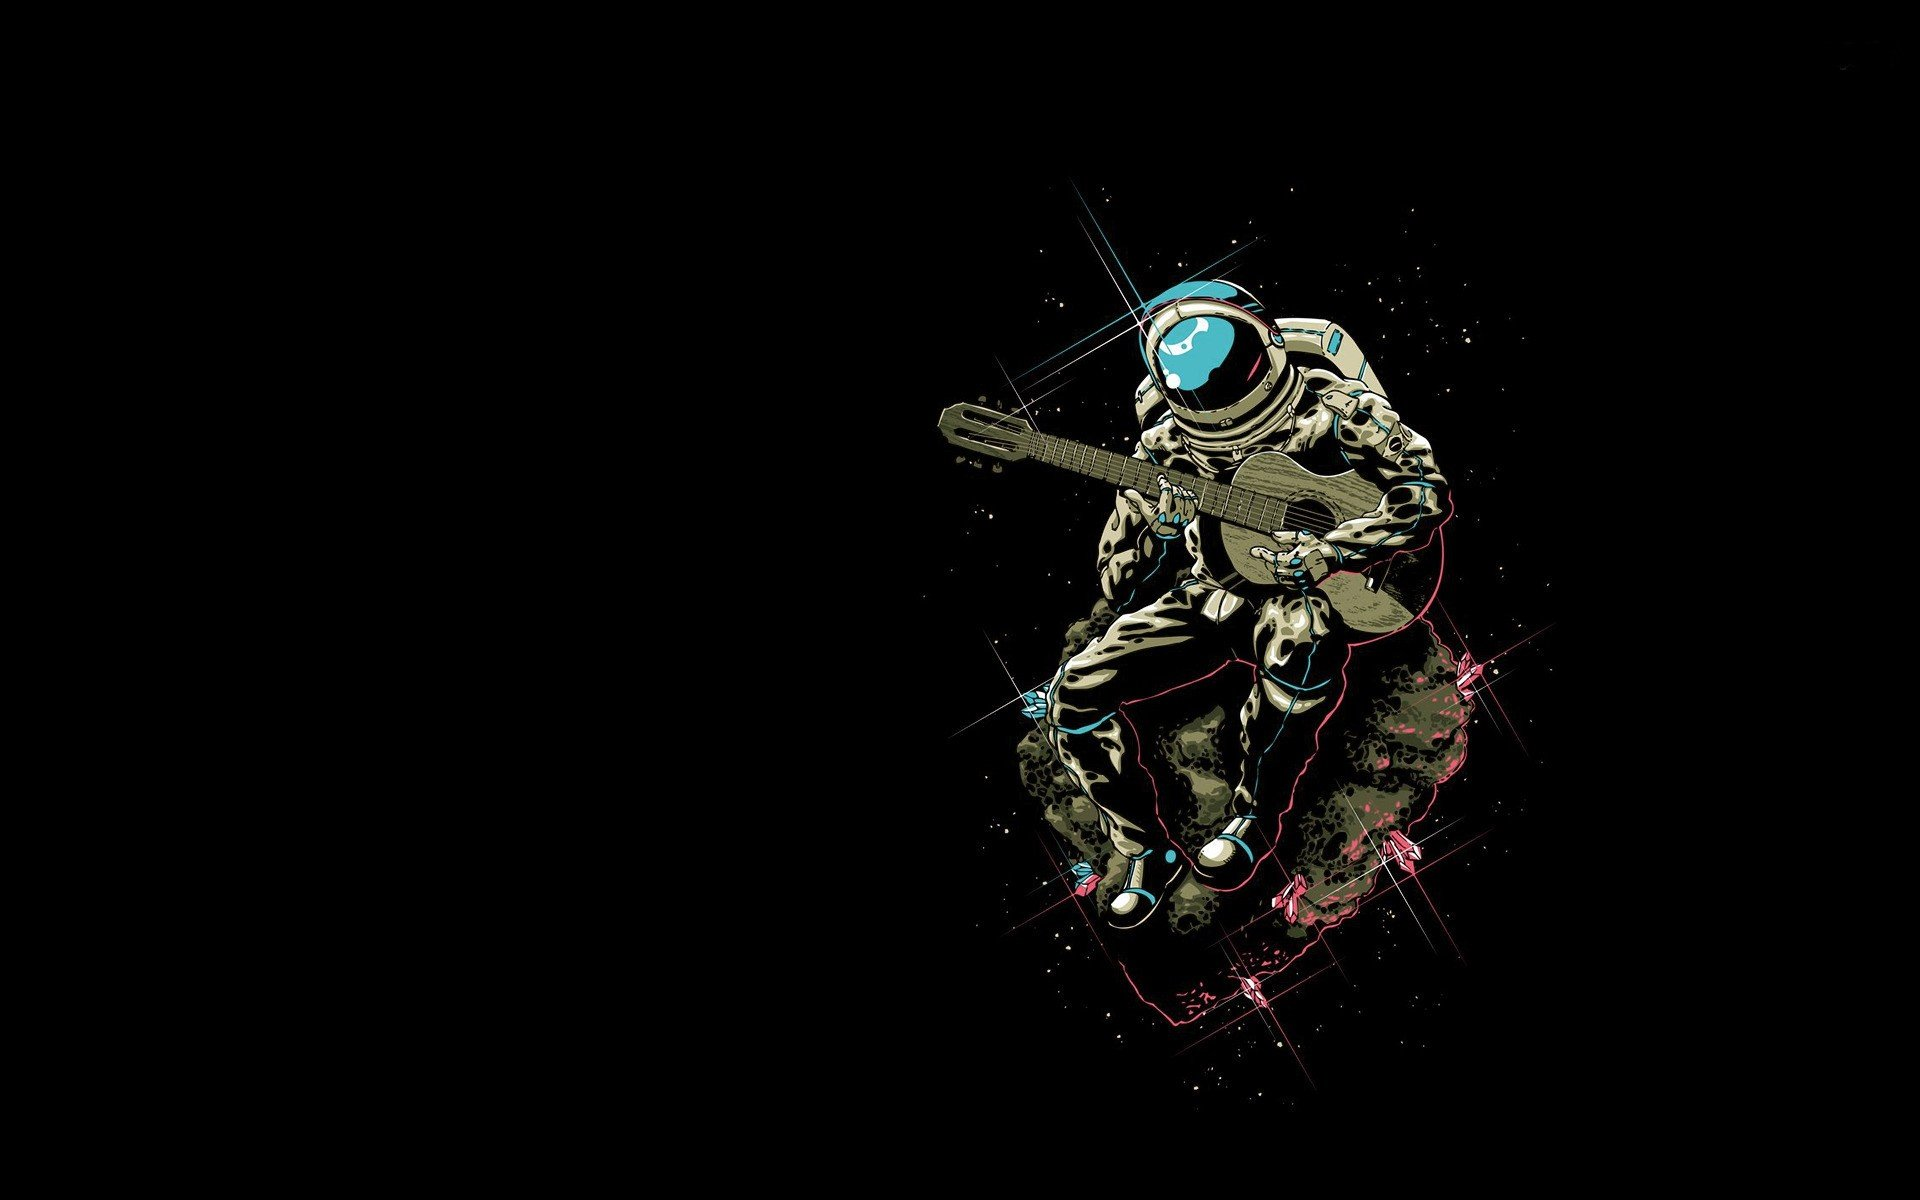 astronaut black background - photo #3